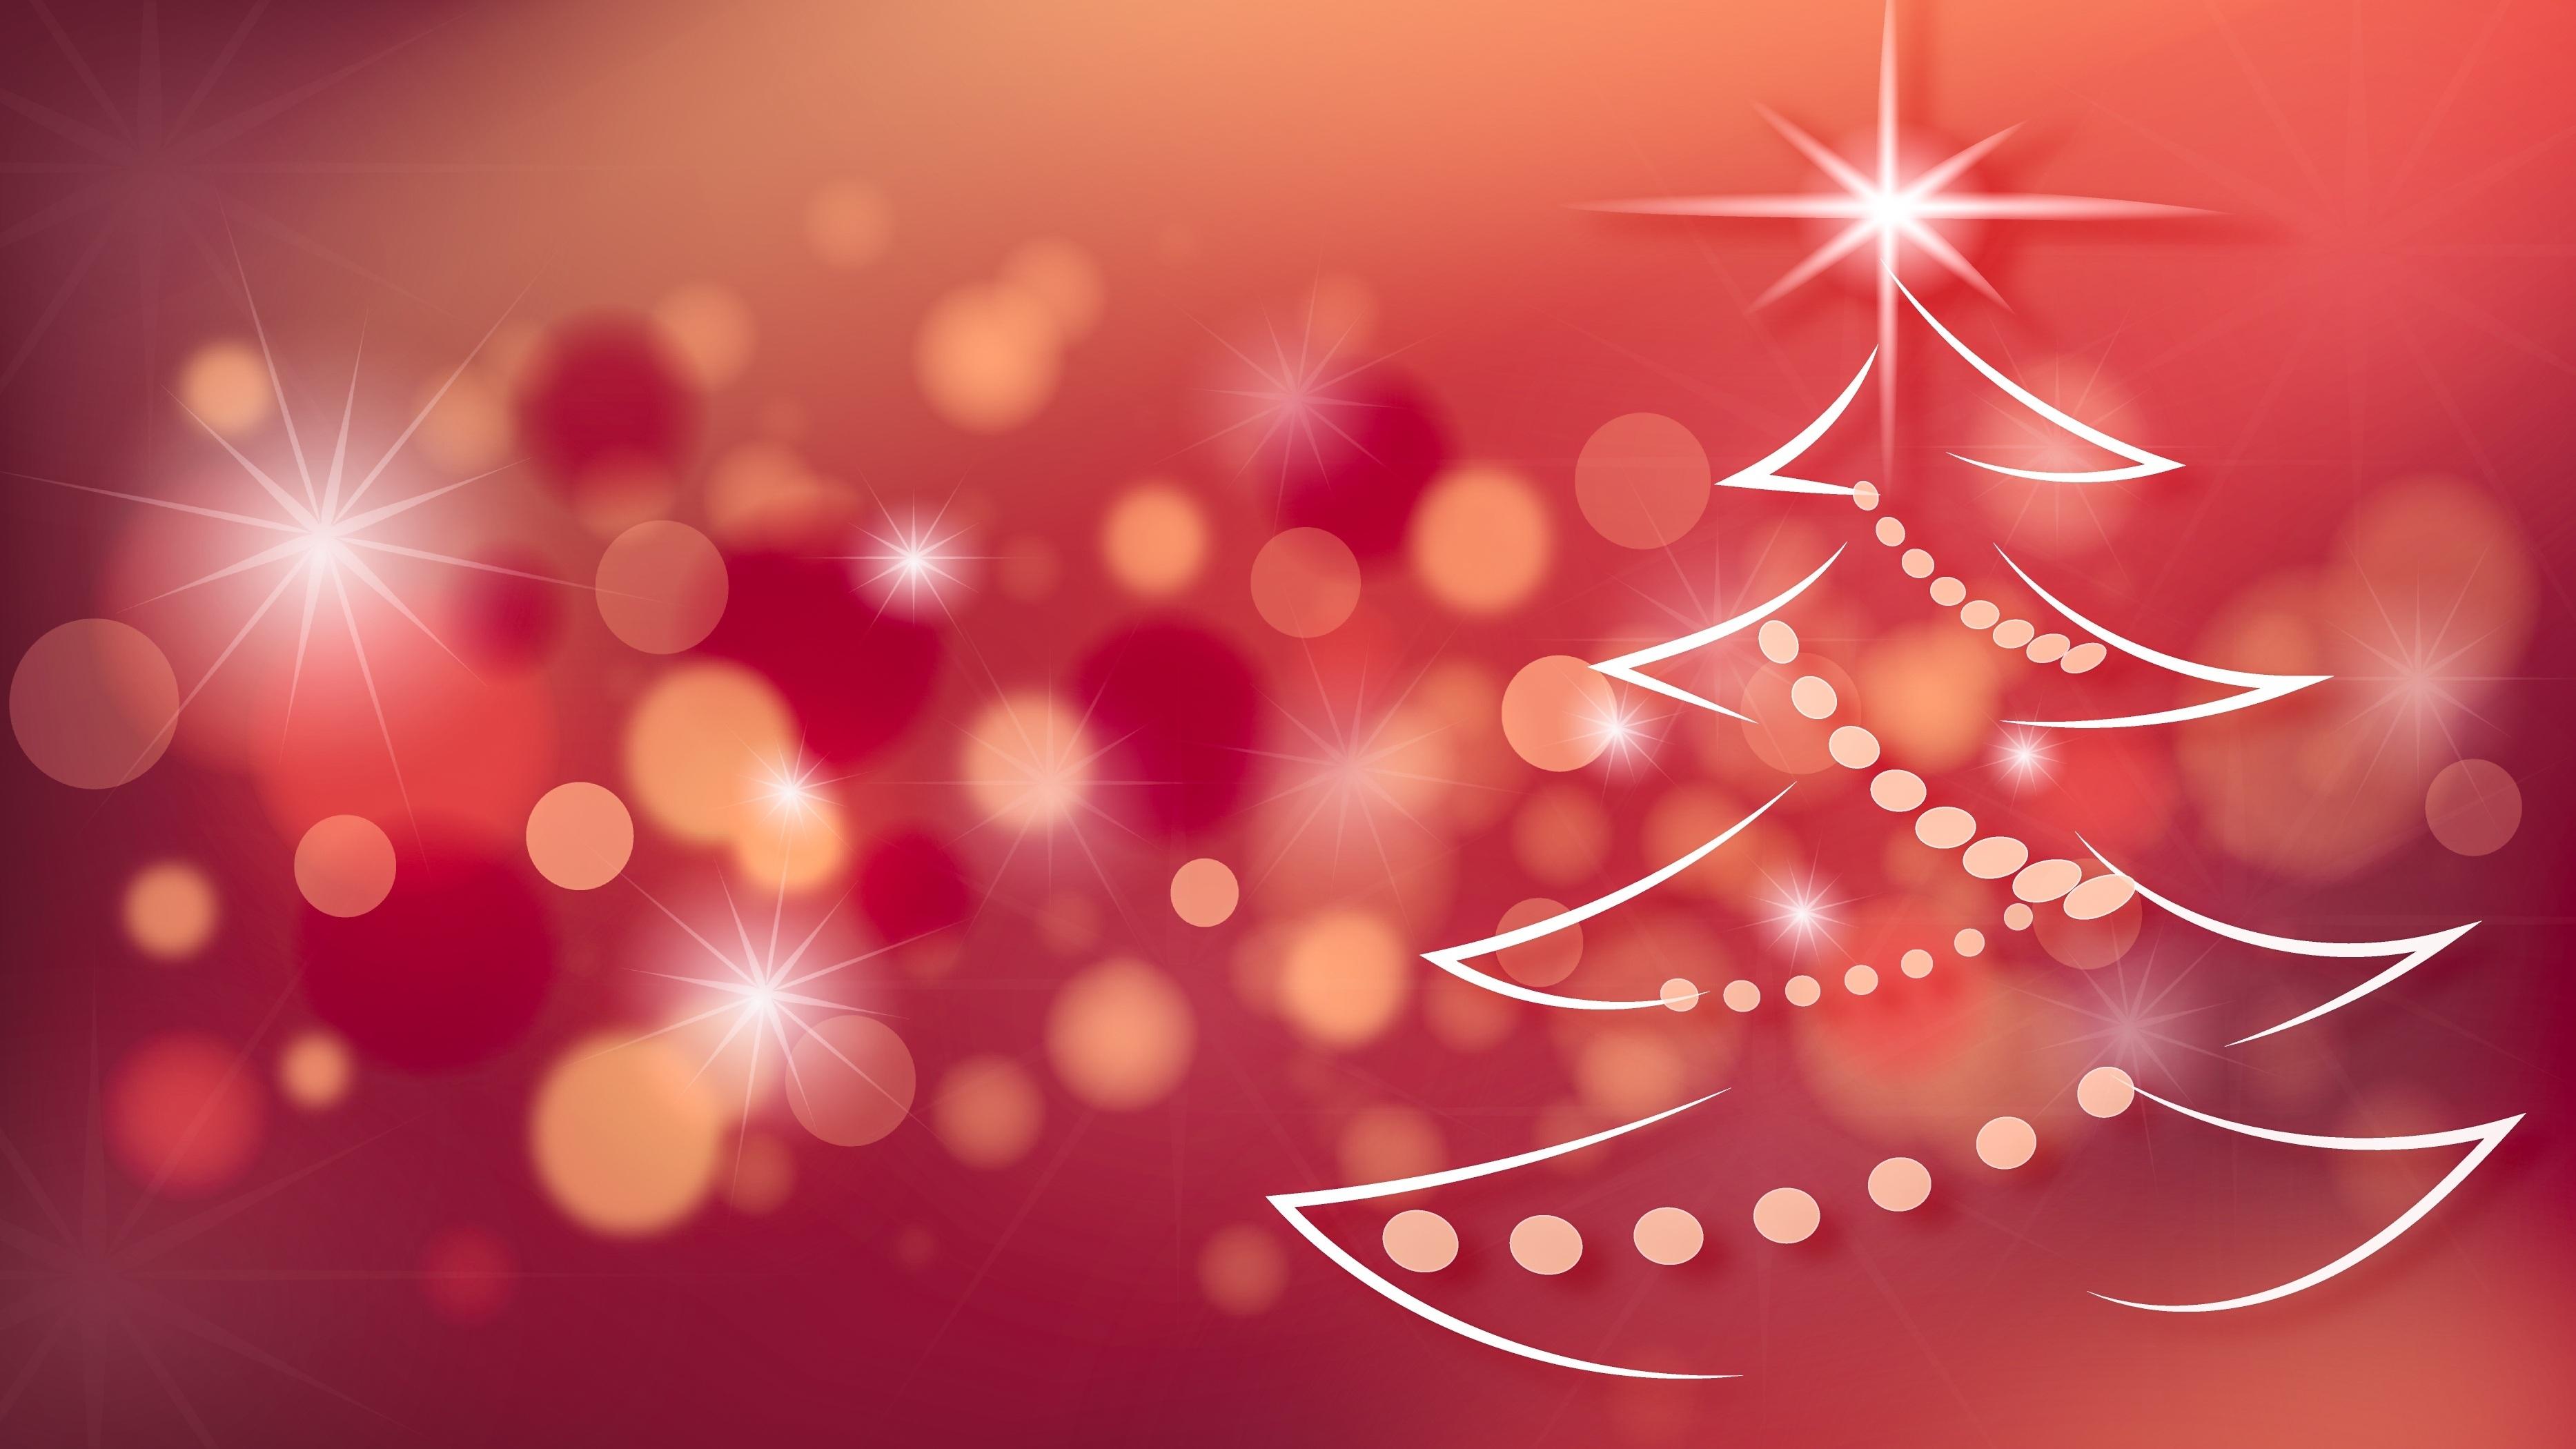 Unique Christmas Desktop Wallpaper Wallpaper Collections 3733x2100